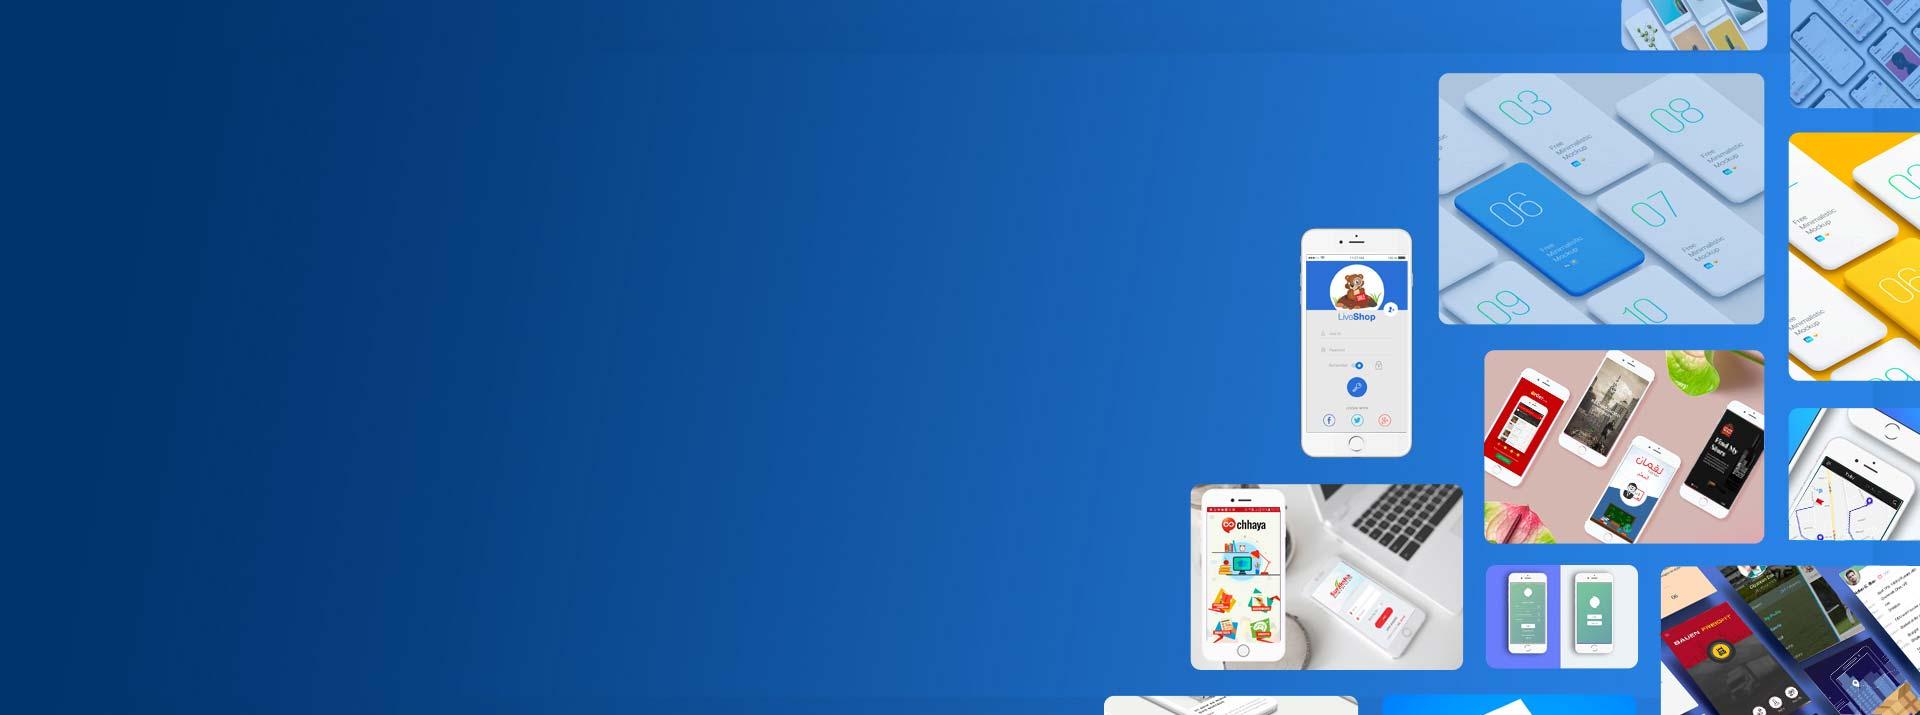 Banner image for Mobile app designs & development services